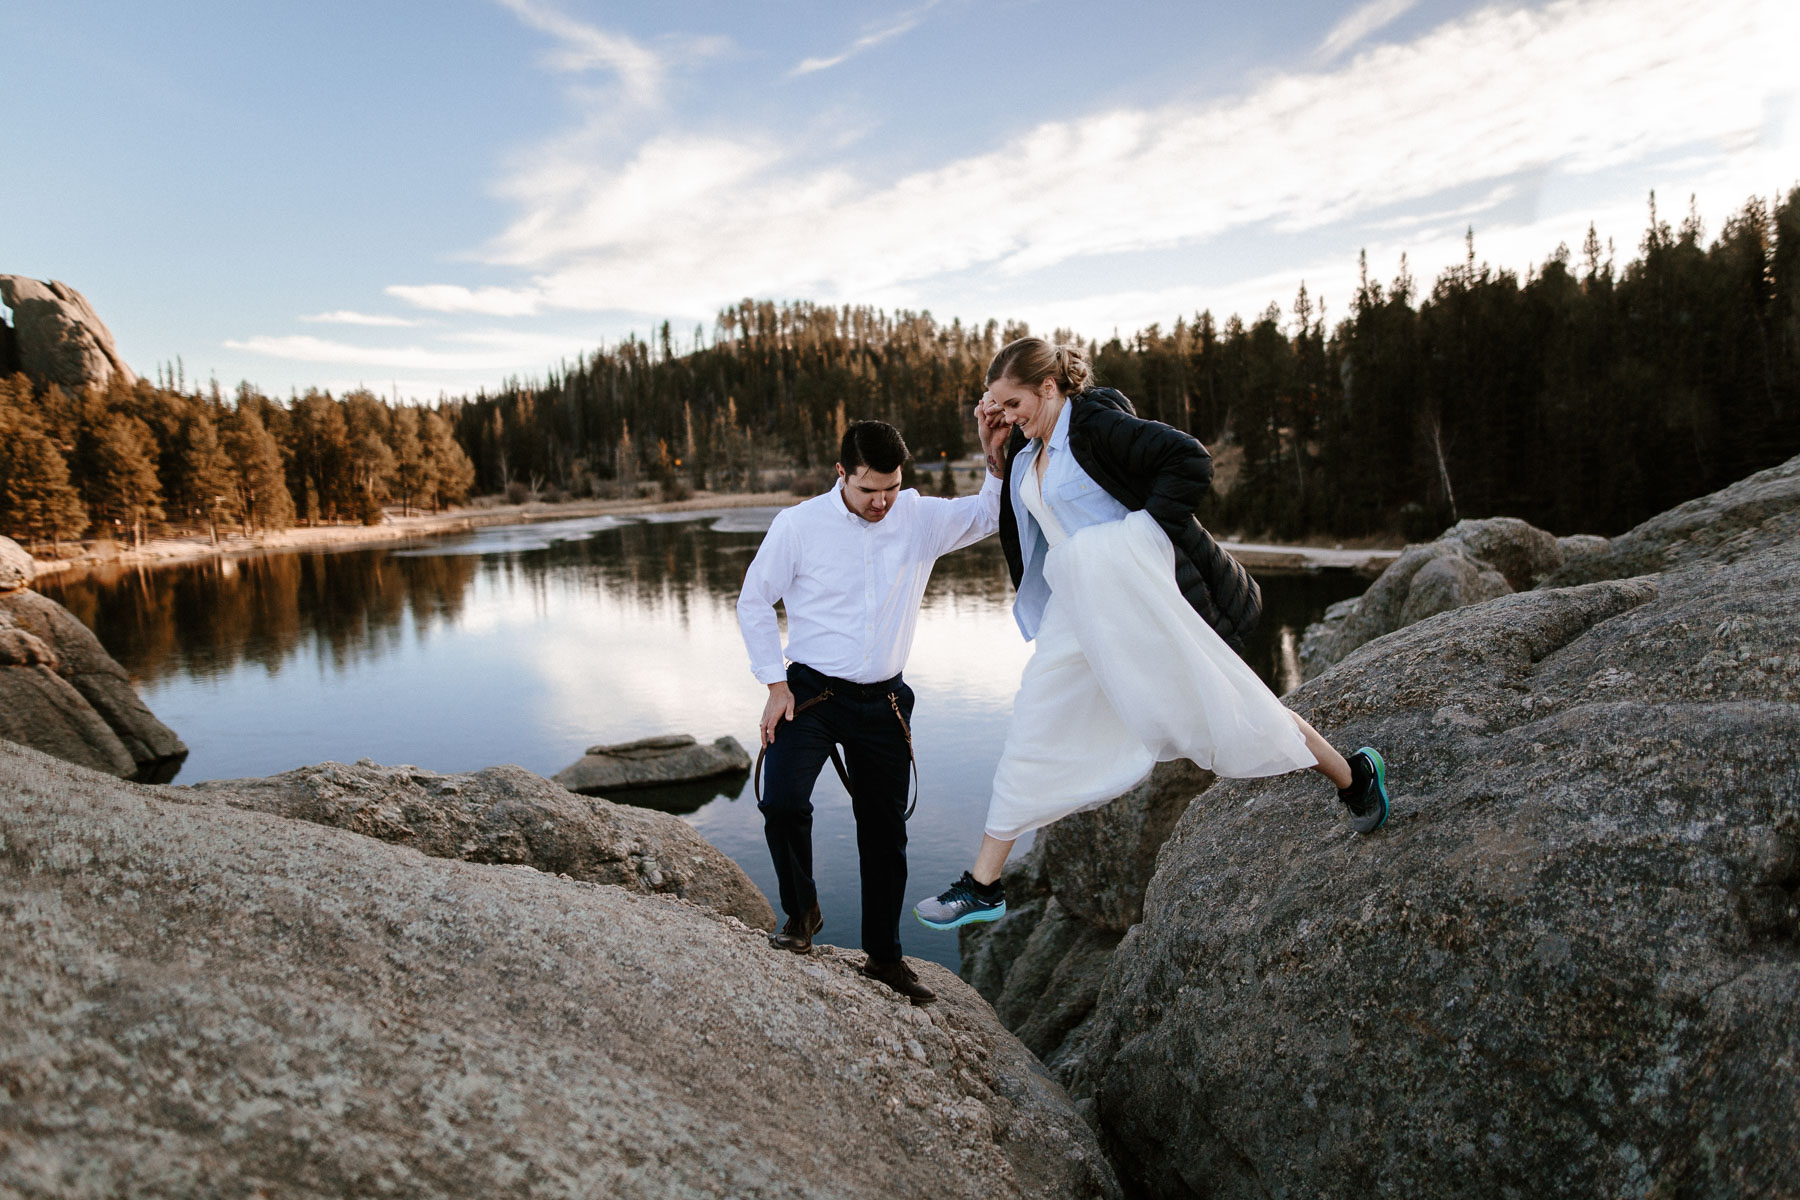 sioux-falls-black-hills-rapid-city-elopement-wedding-adventure-photographer-custer-sylvan-lake-37.jpg